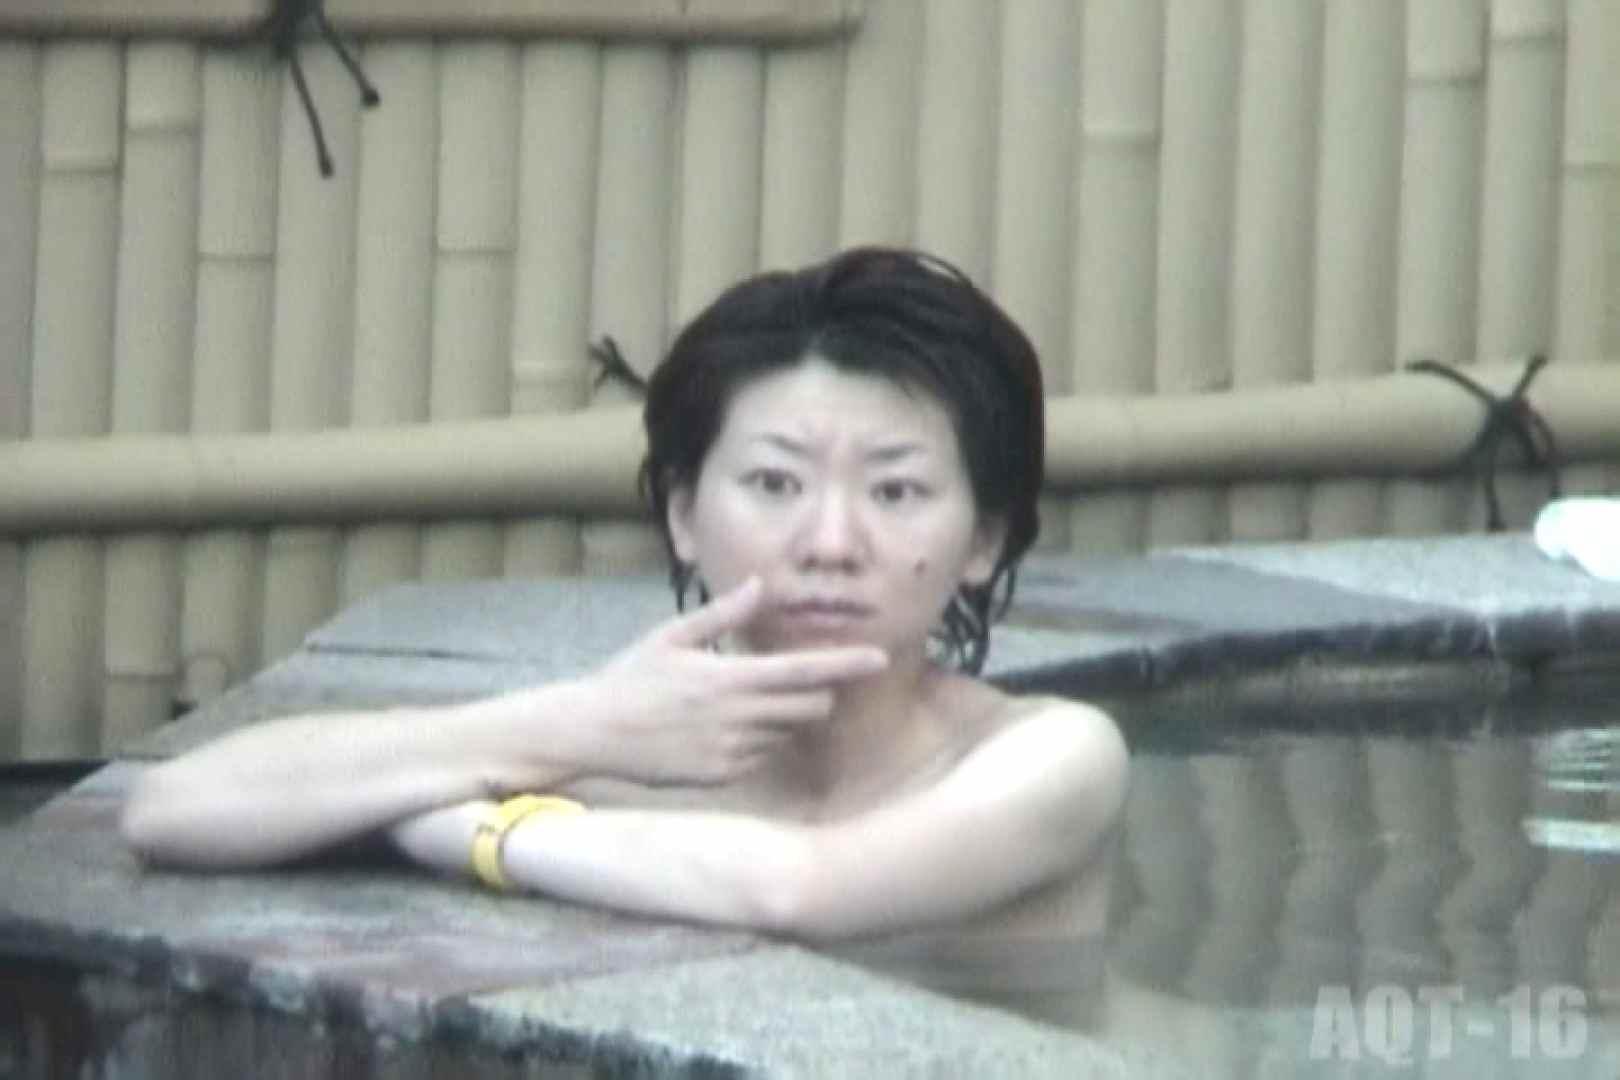 Aquaな露天風呂Vol.842 露天風呂突入 AV動画キャプチャ 96pic 92